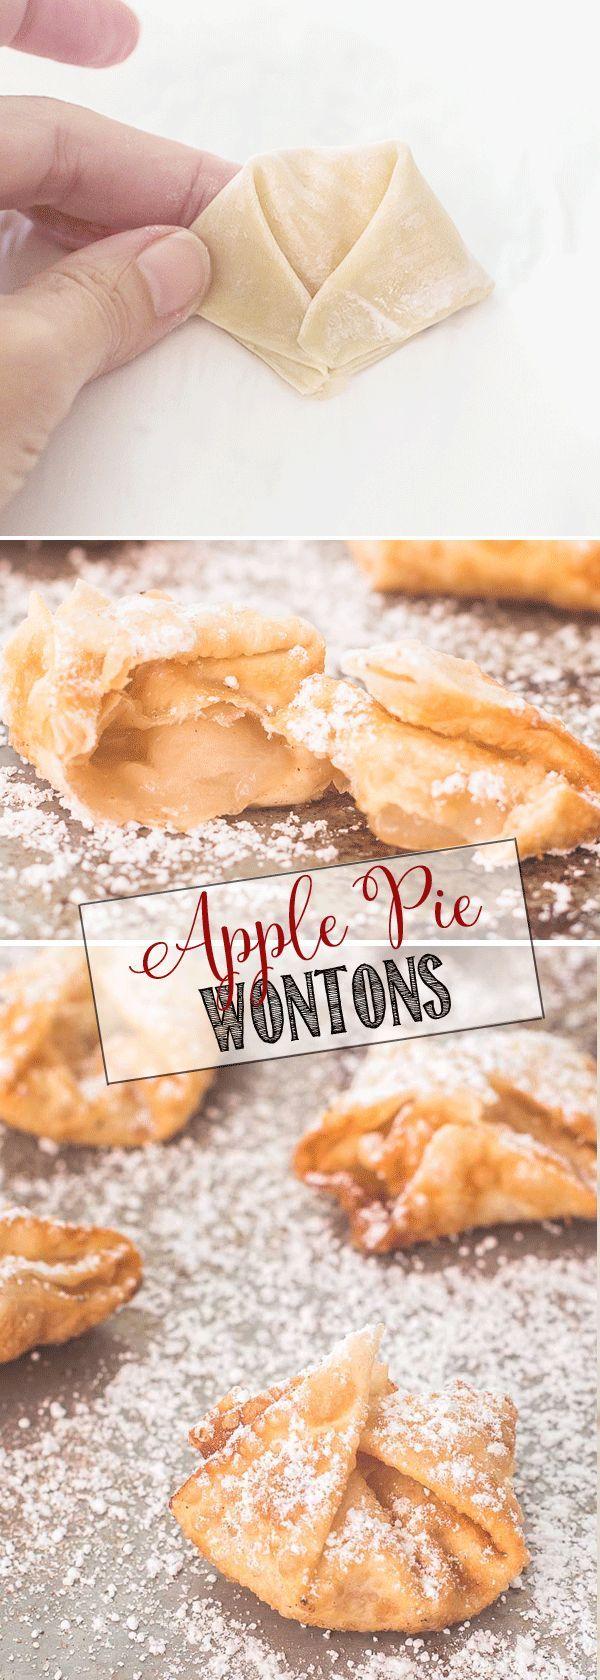 Apple Pie Wontons Recipe Apple Pie Wontons with cinnamon sugar and powdered sugar| Apple Pie Bites | Easy Dessert Recipe The perfect bite-sized treat!